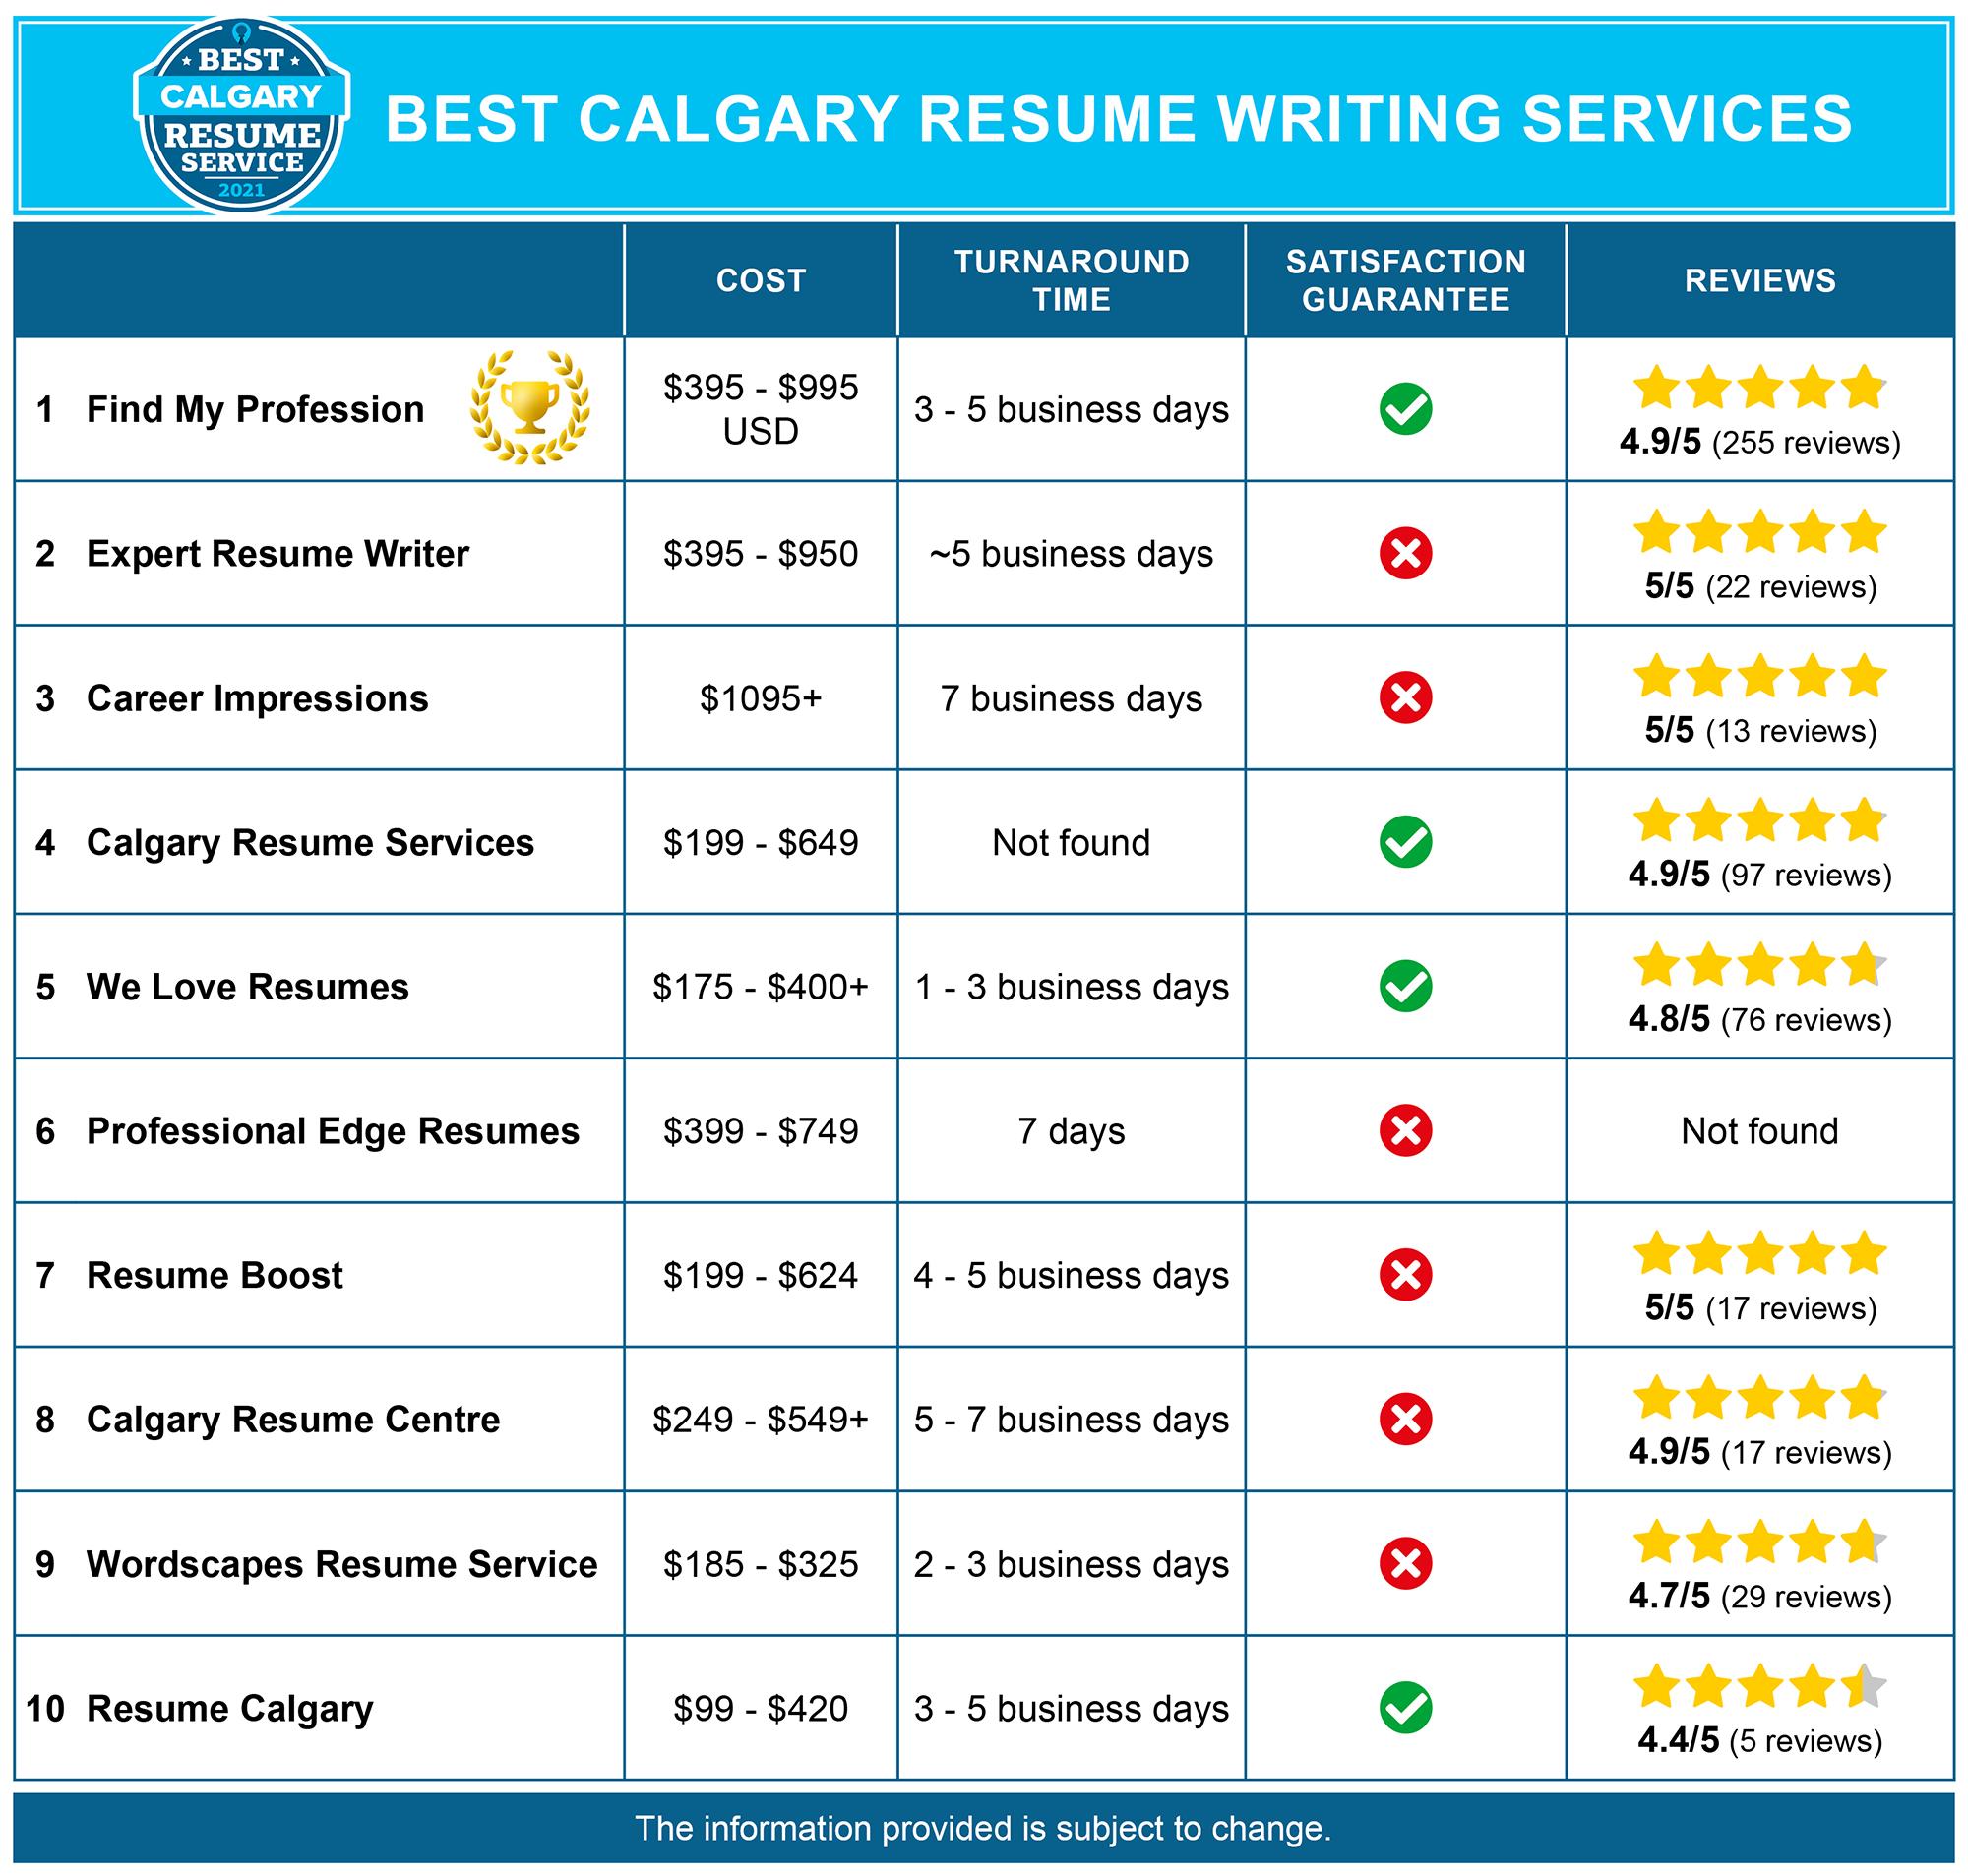 Best Calgary Resume Services